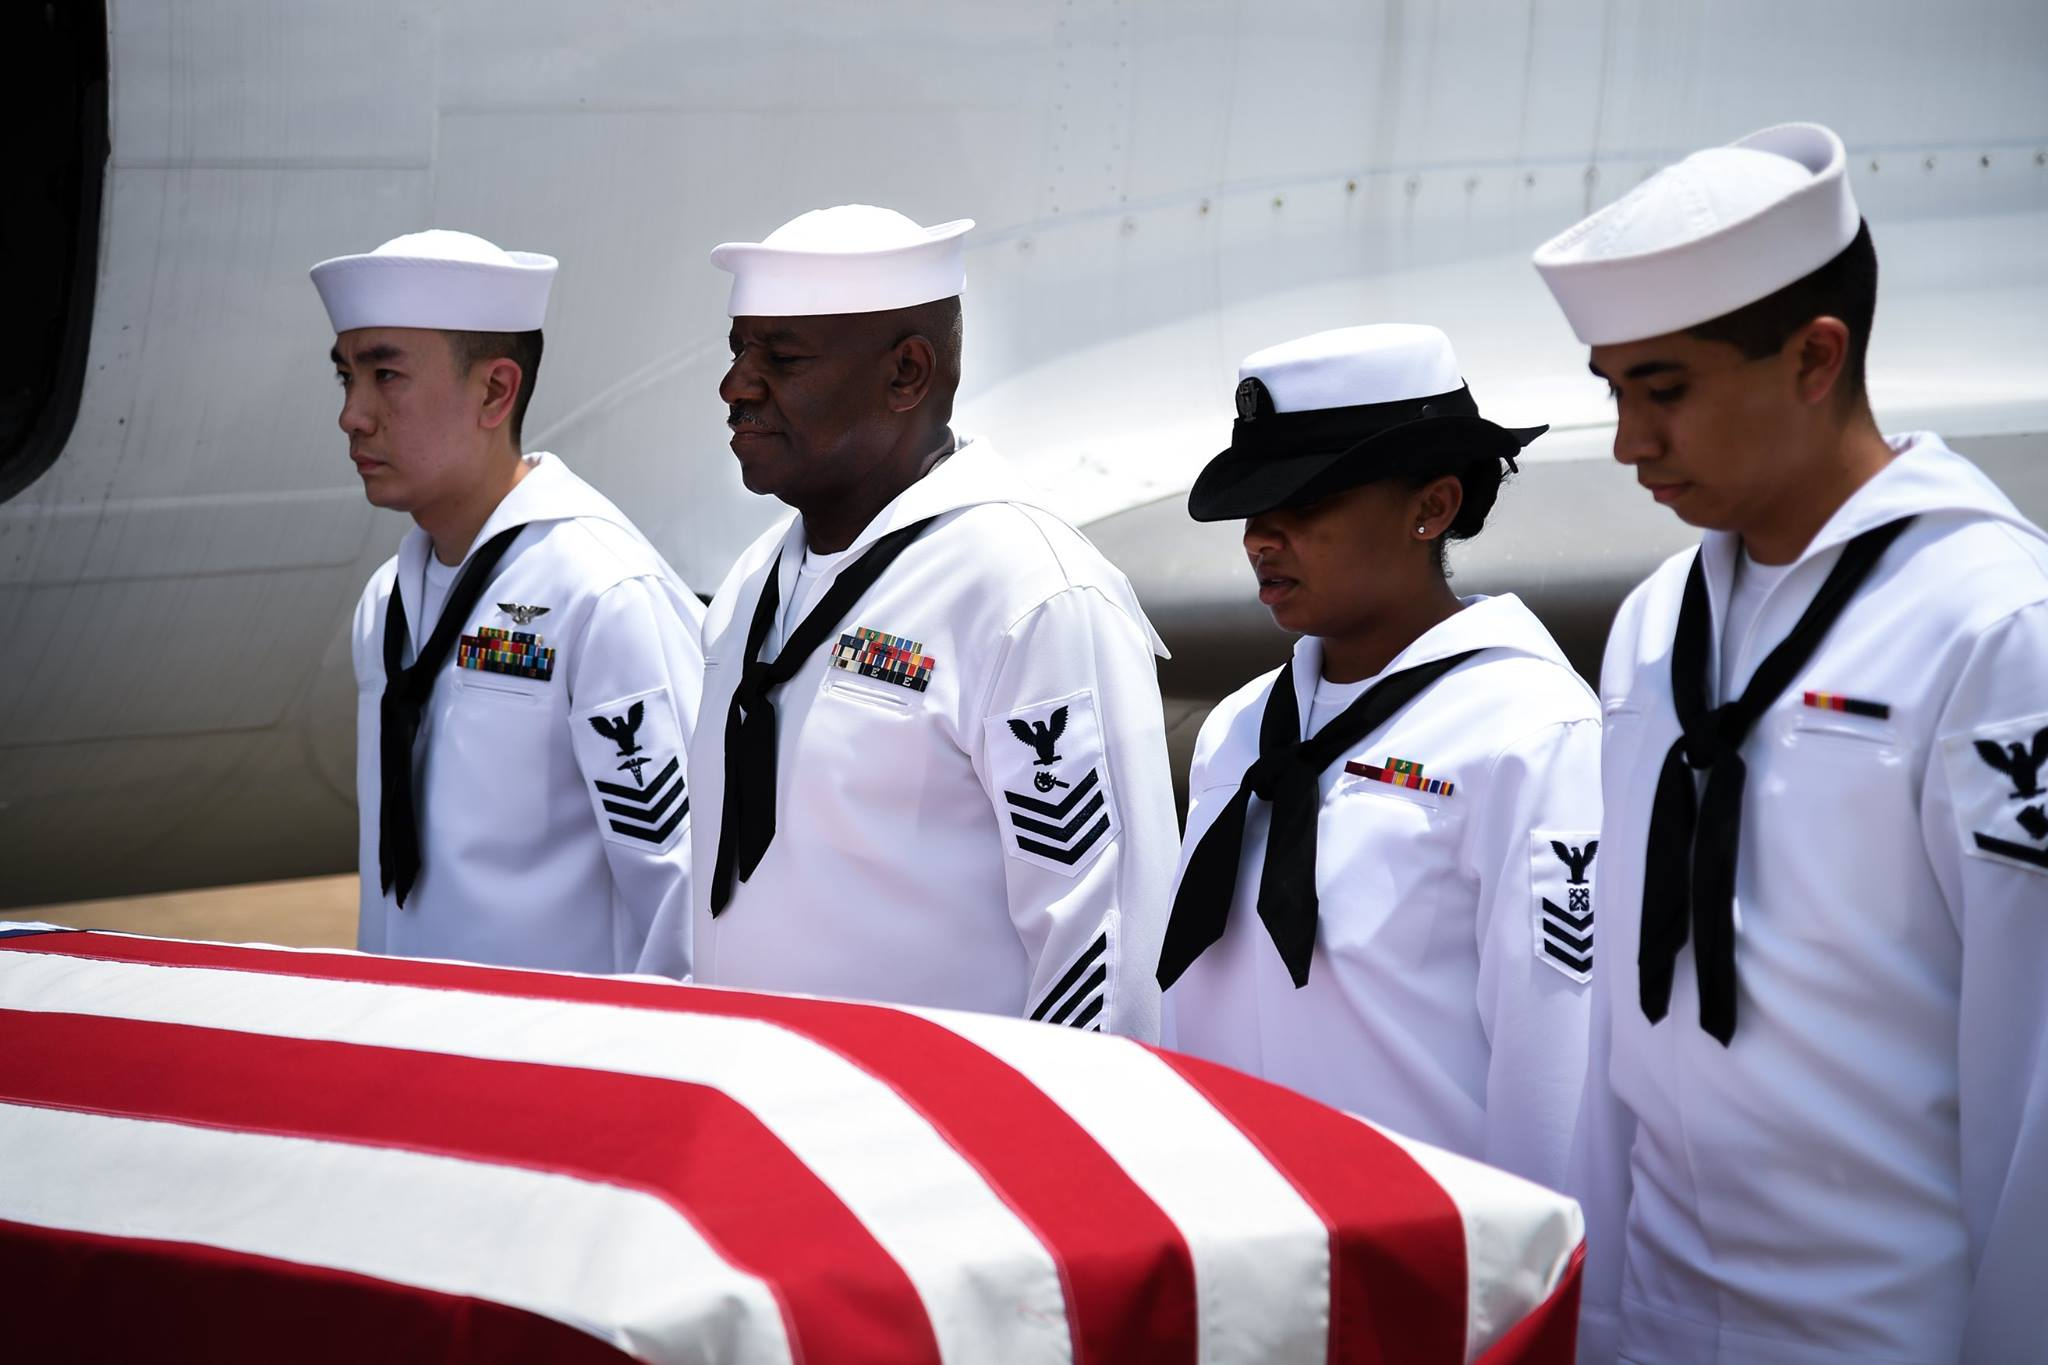 Senior Chief Petty Officer Alonzo Evans 1_1501175074651.jpg